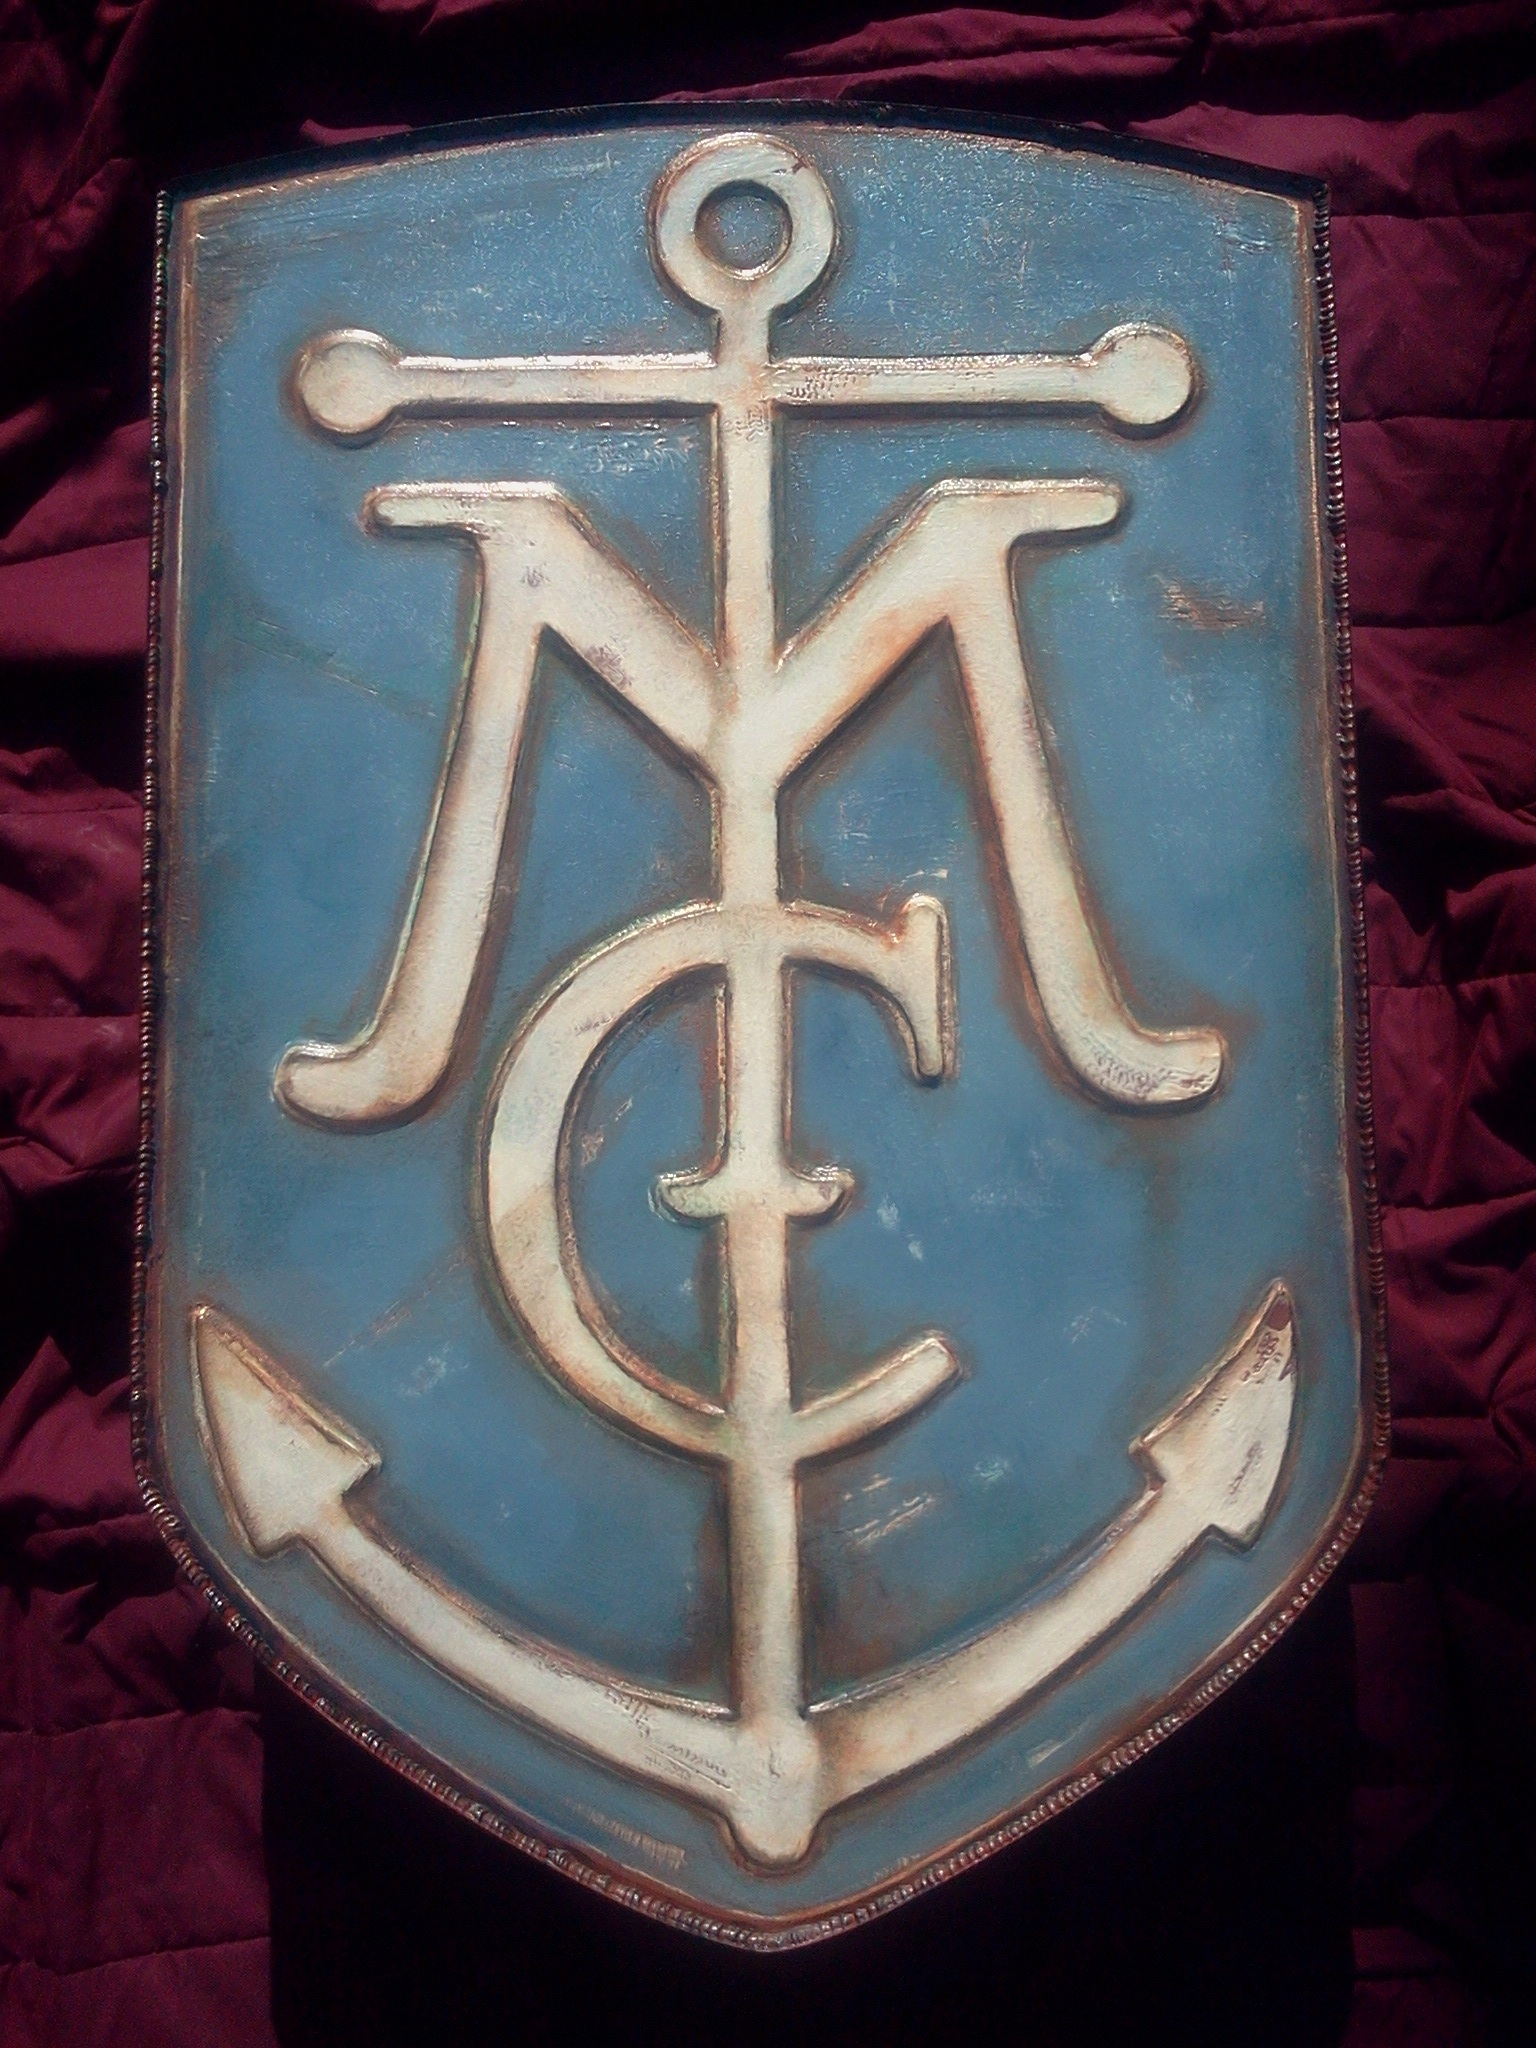 Yacht club sign